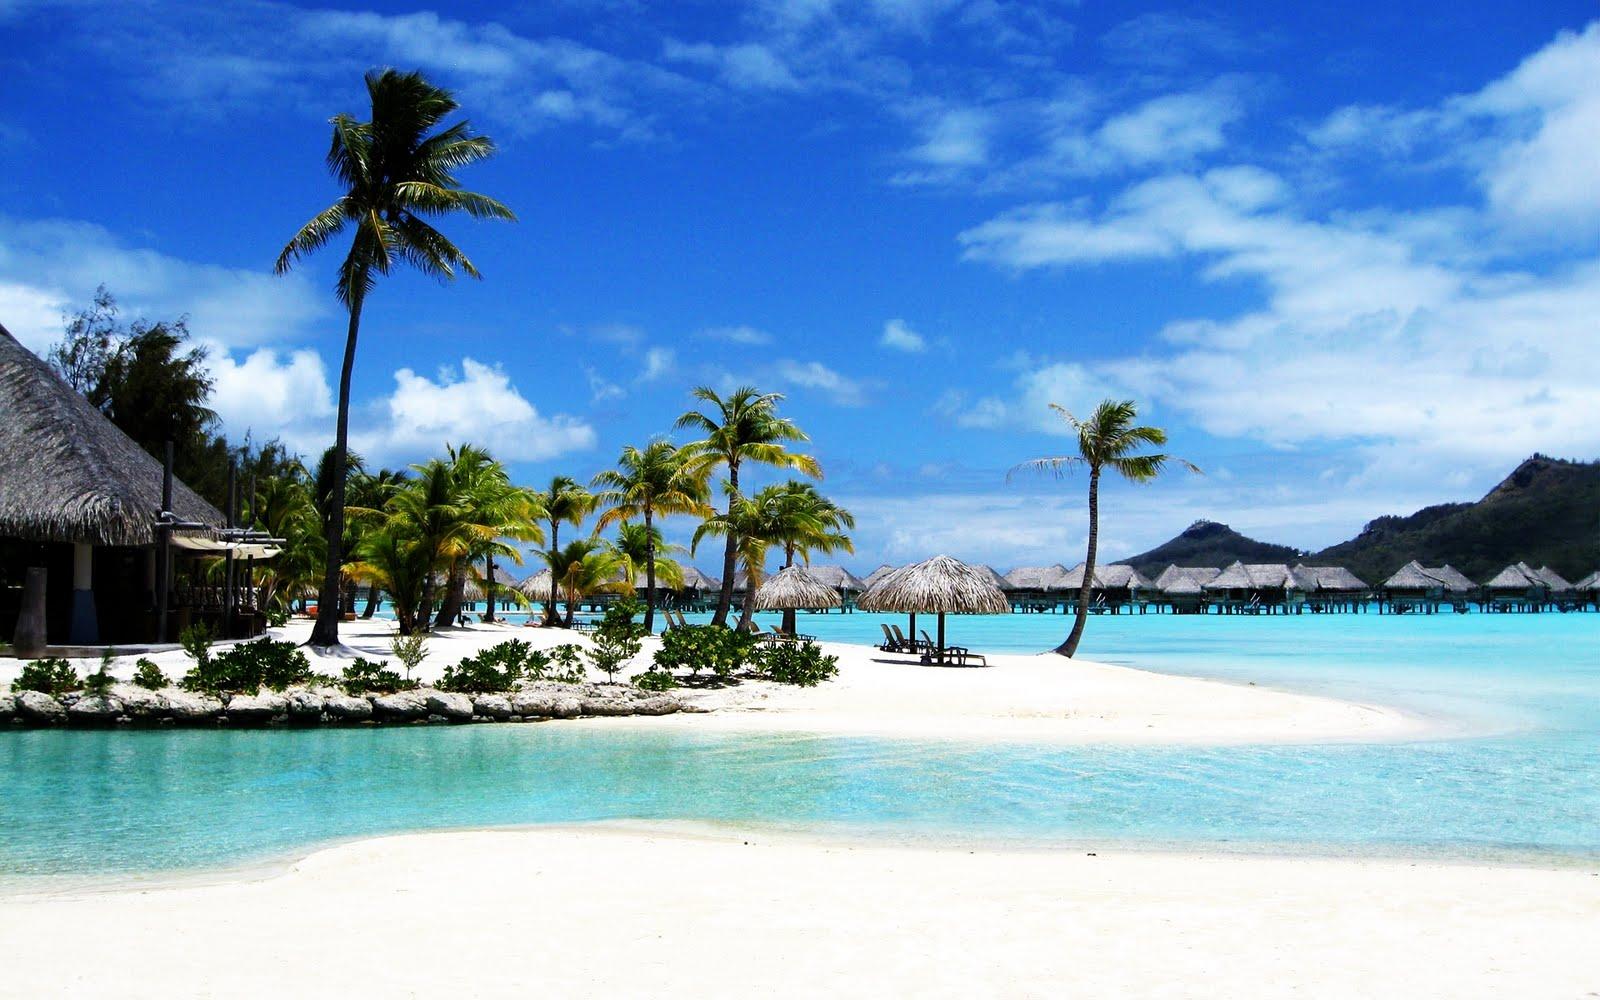 Fondos de pantalla de verano con paisajes wallpapers hd for Fotos fondo de escritorio gratis